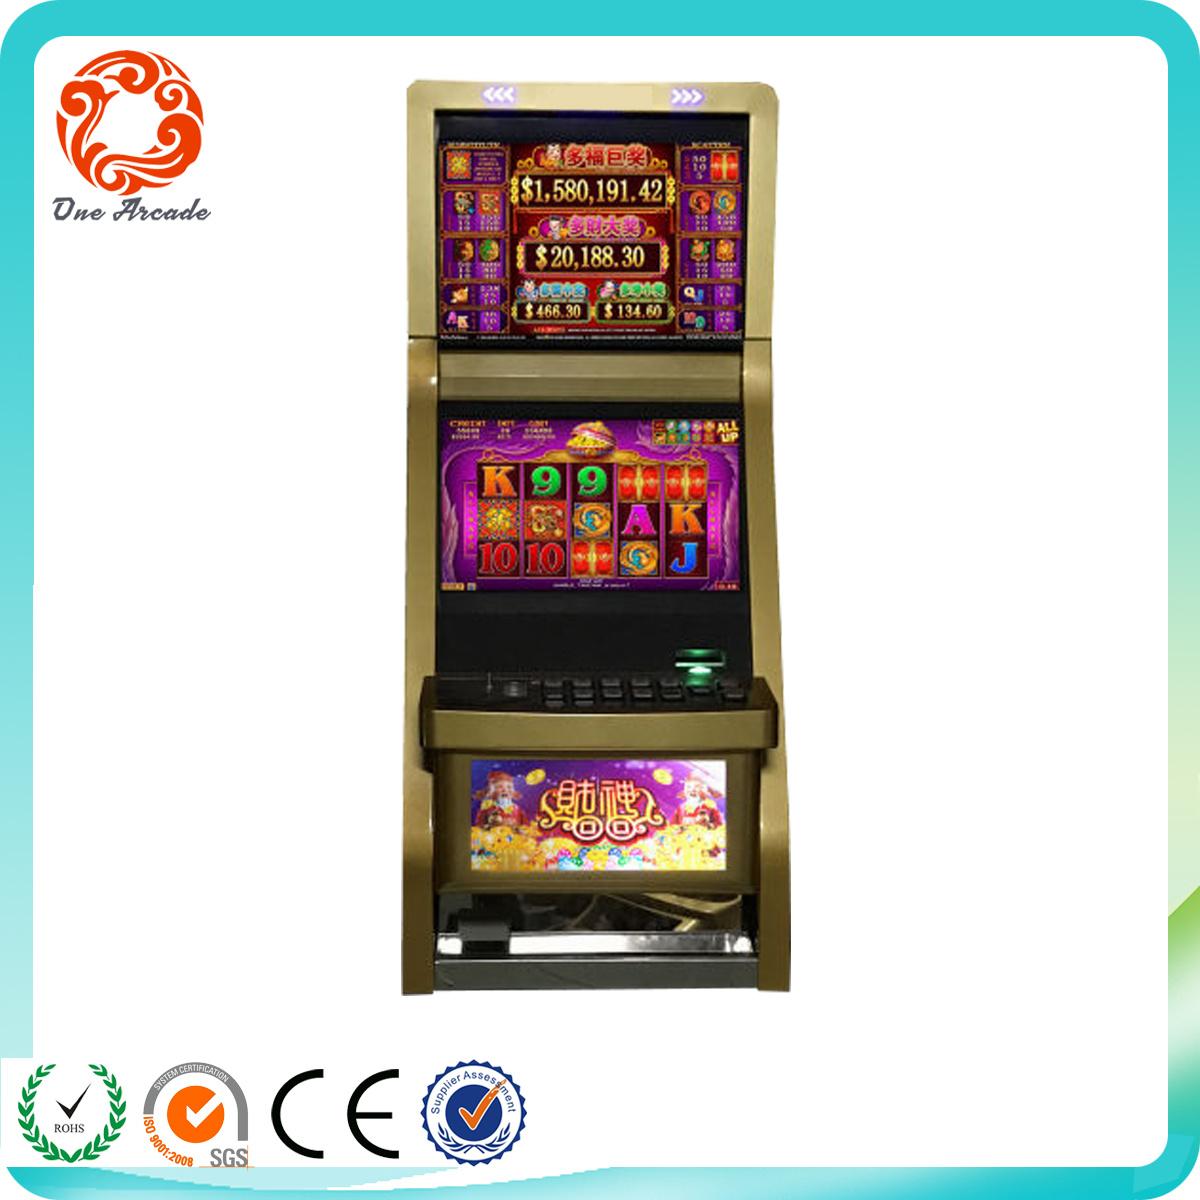 Arcade Funny Bingo Slot Gambling Game Machine for Adult